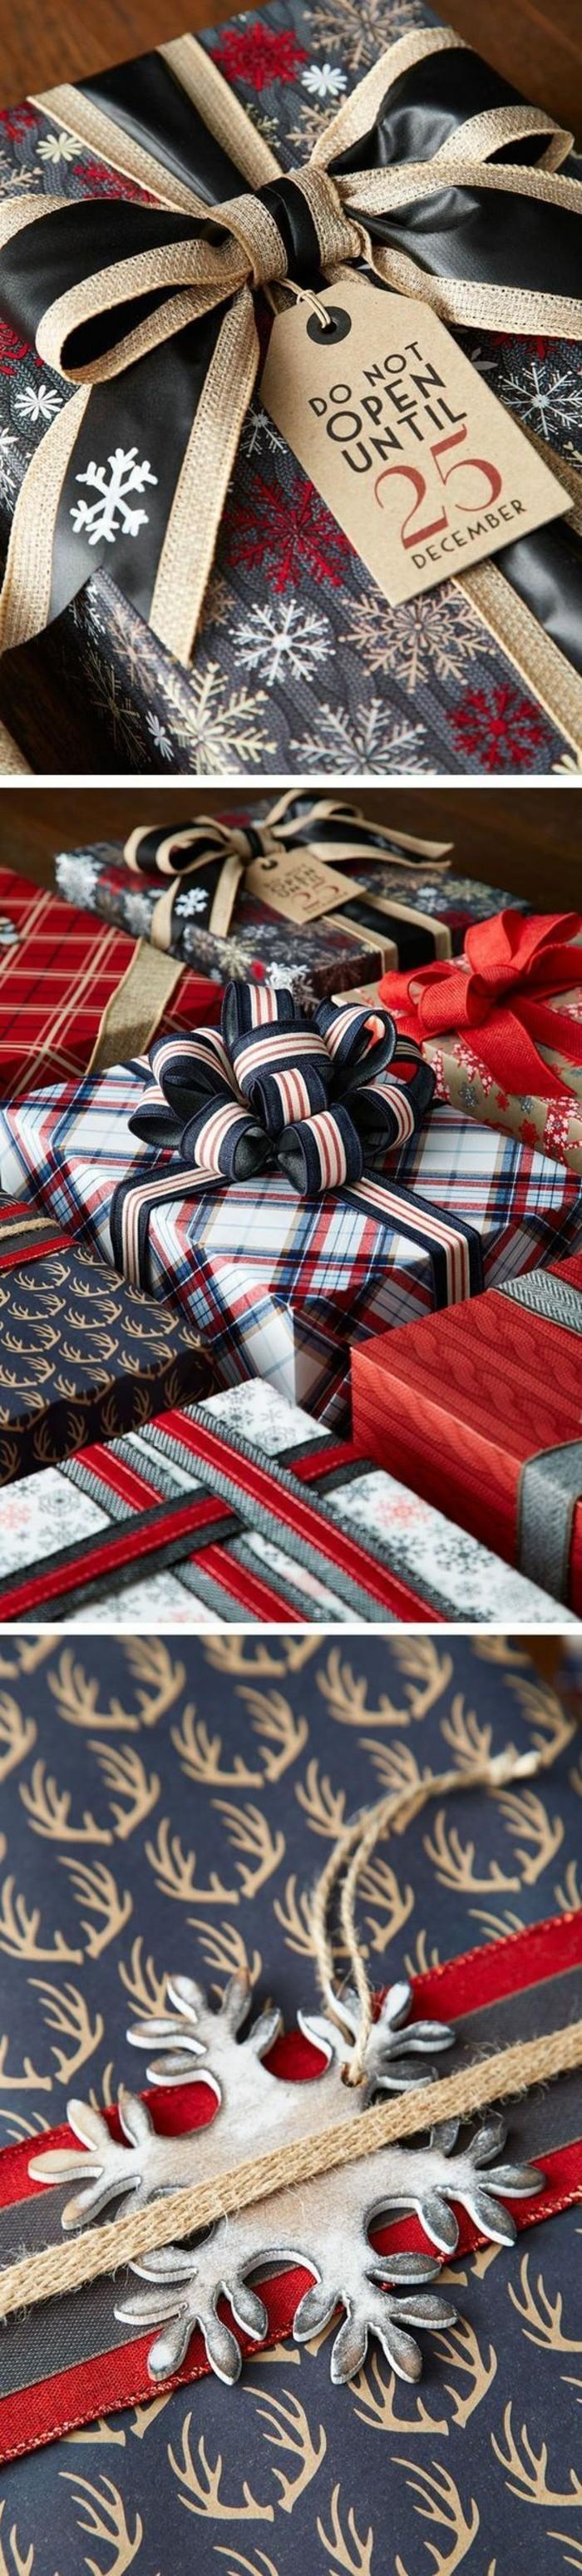 geschenkverpackung-verpackungen-basteln-in-gold-schwarz-rot